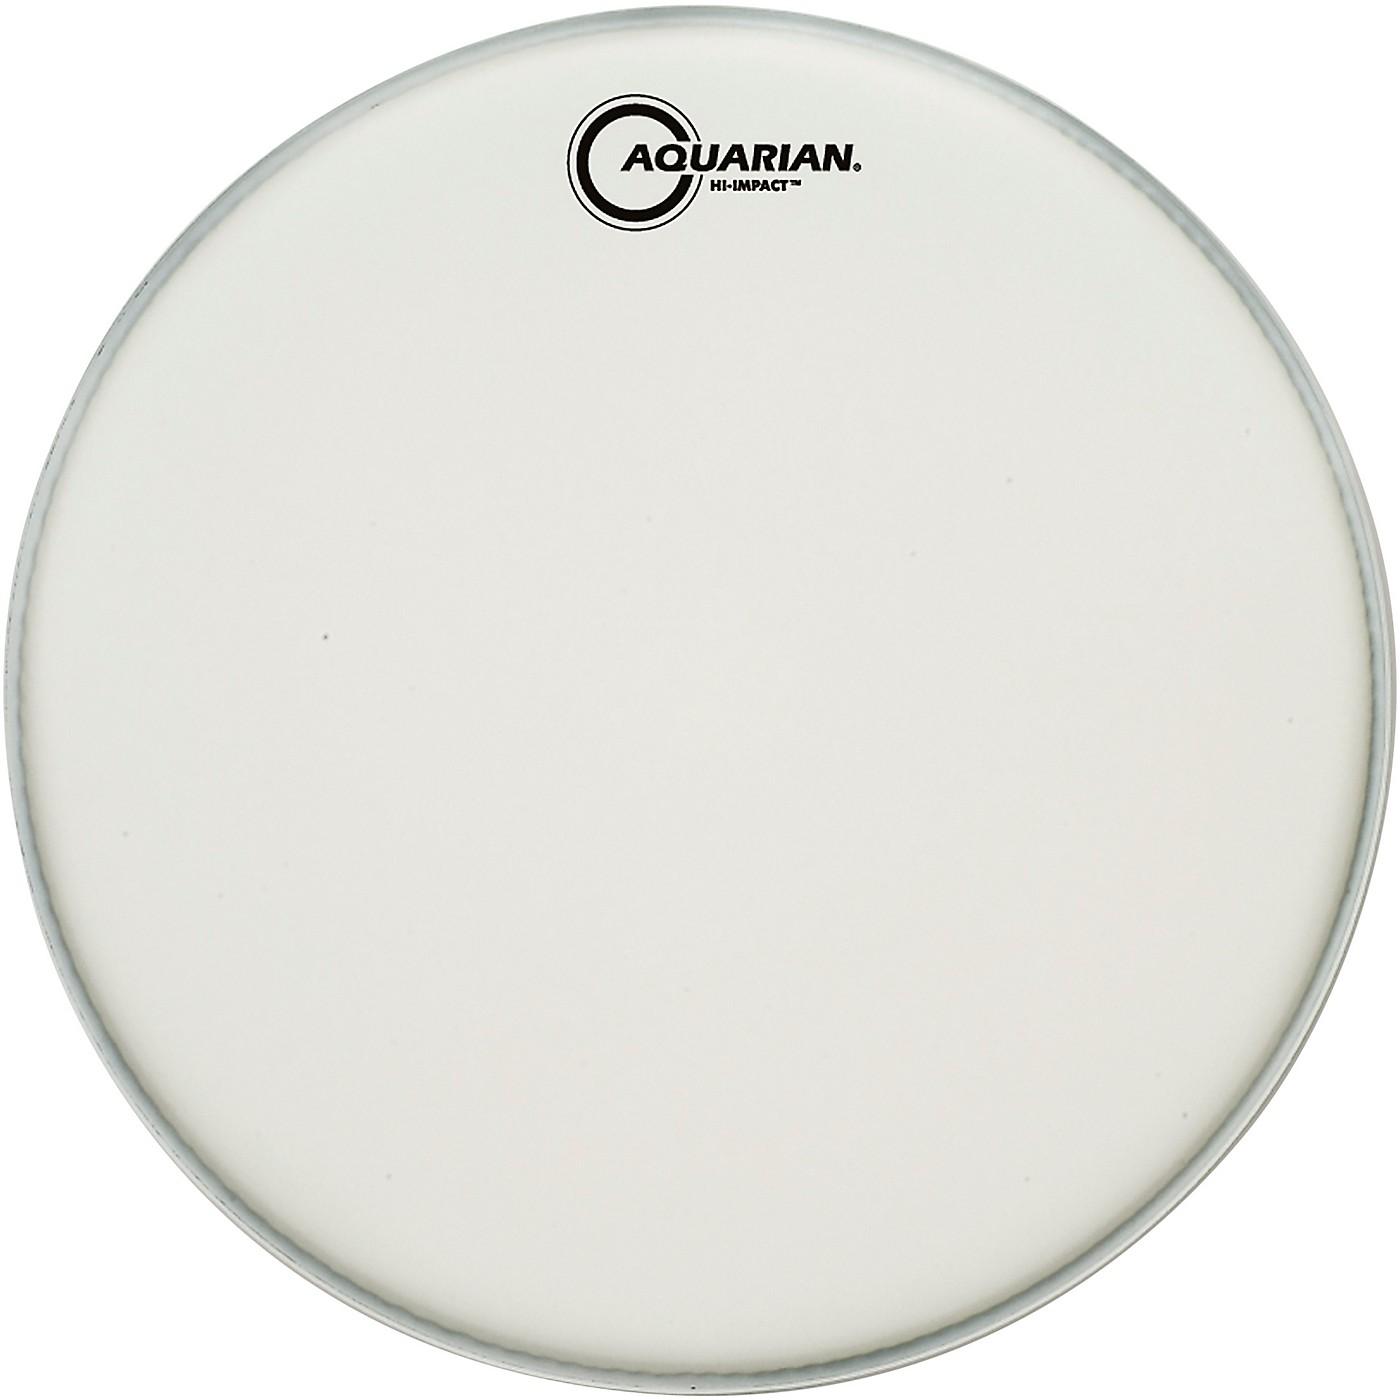 Aquarian Hi-Impact Snare White Snare Drum Head thumbnail